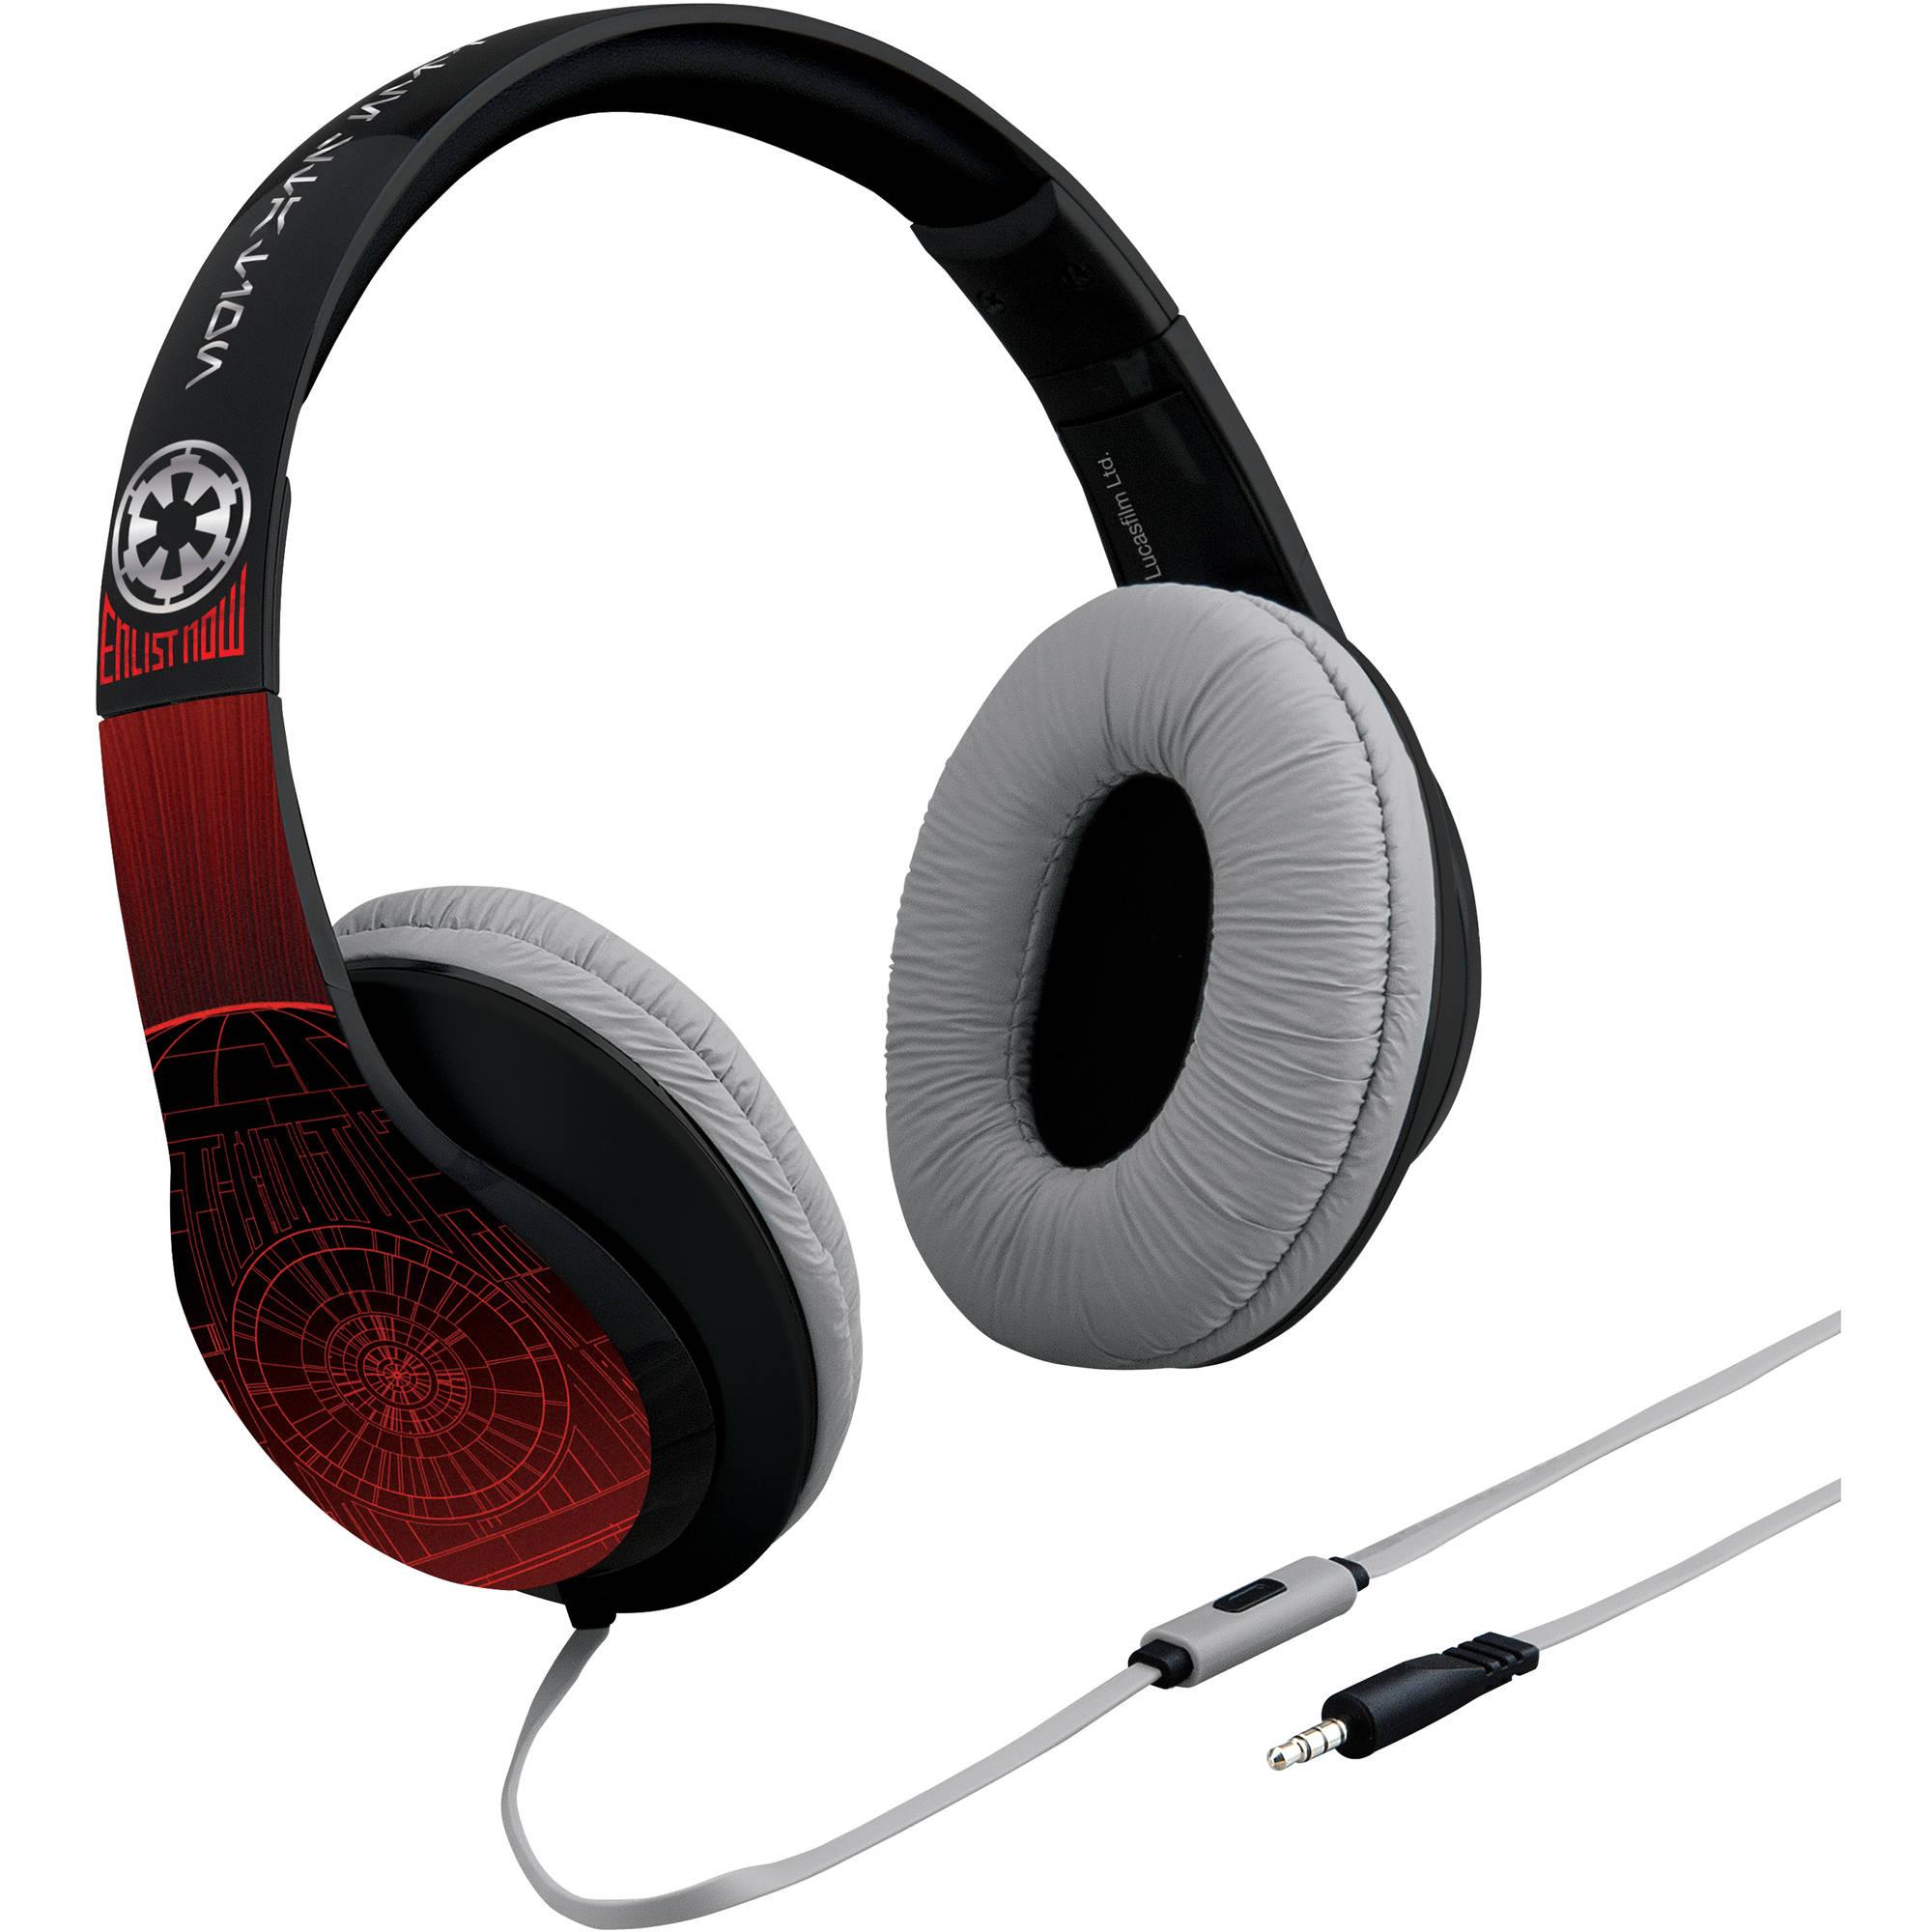 Lucas Star Wars Rogue One iHome Over-the-Ear Headphones